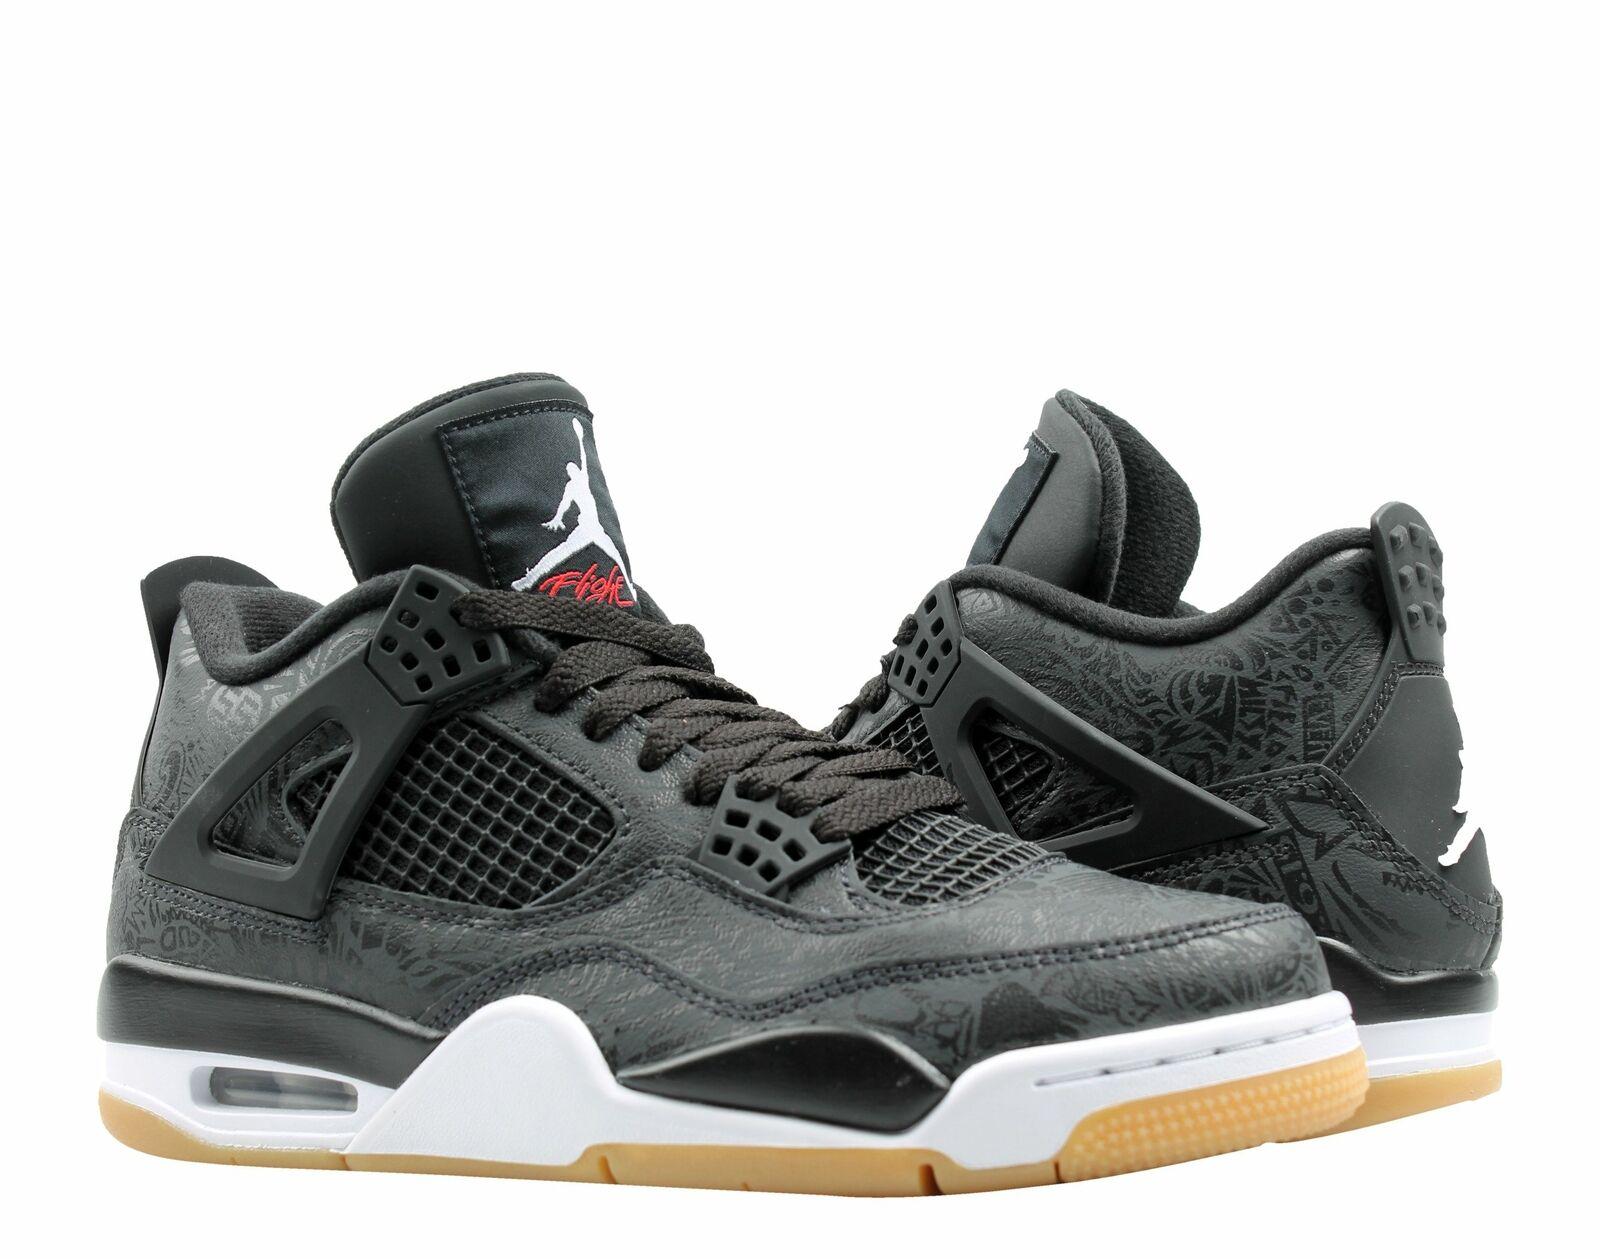 Nike Air Jordan 4 Retro SE Black White-Gum Men's Basketball shoes CI1184-001